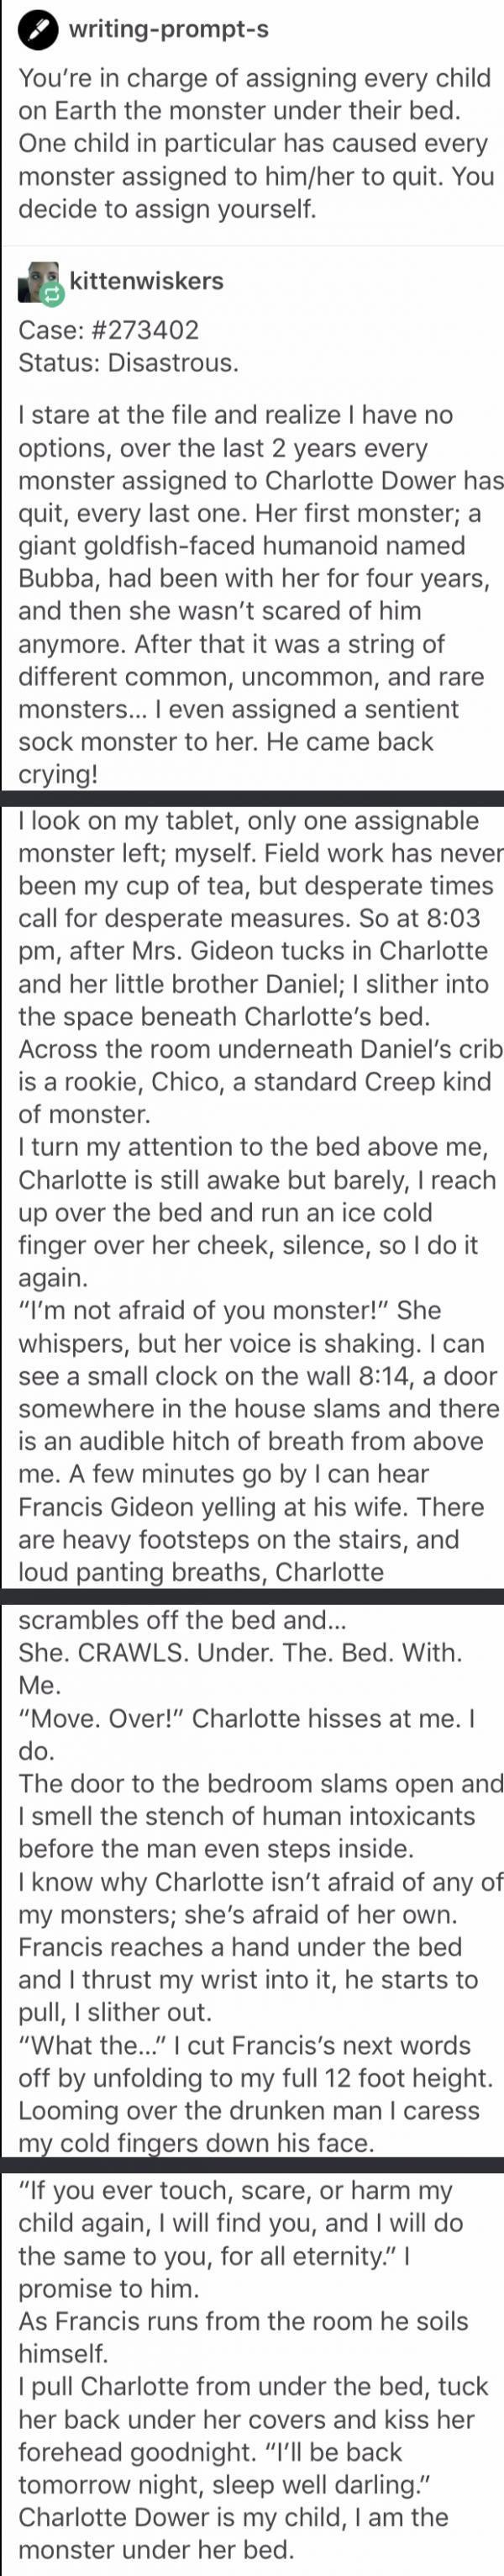 Monster essay prompts